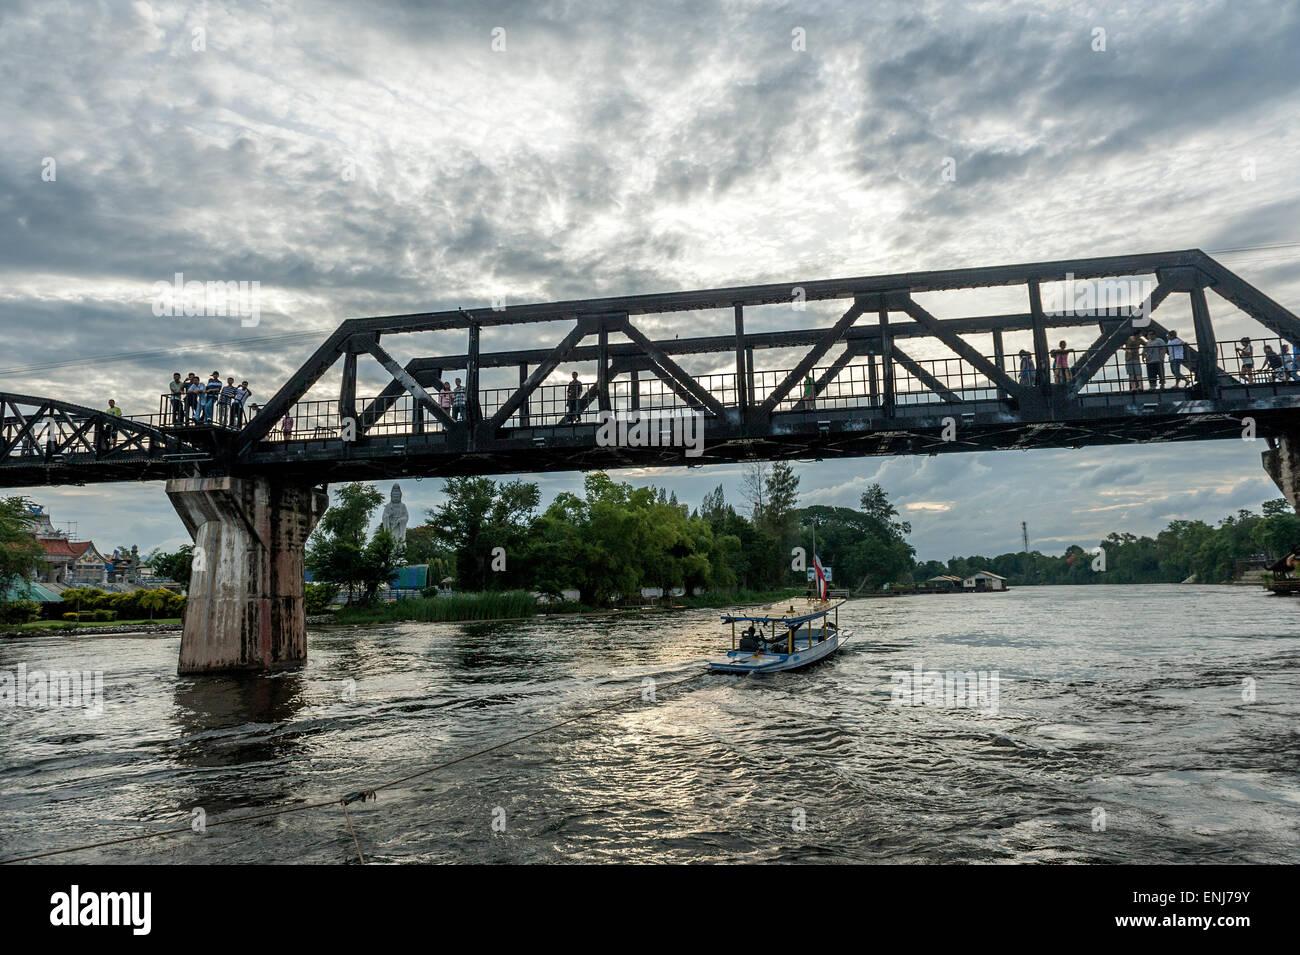 Bridge on the river Kwai. Kanchanaburi, Kanchanaburi Province, Thailand - Stock Image